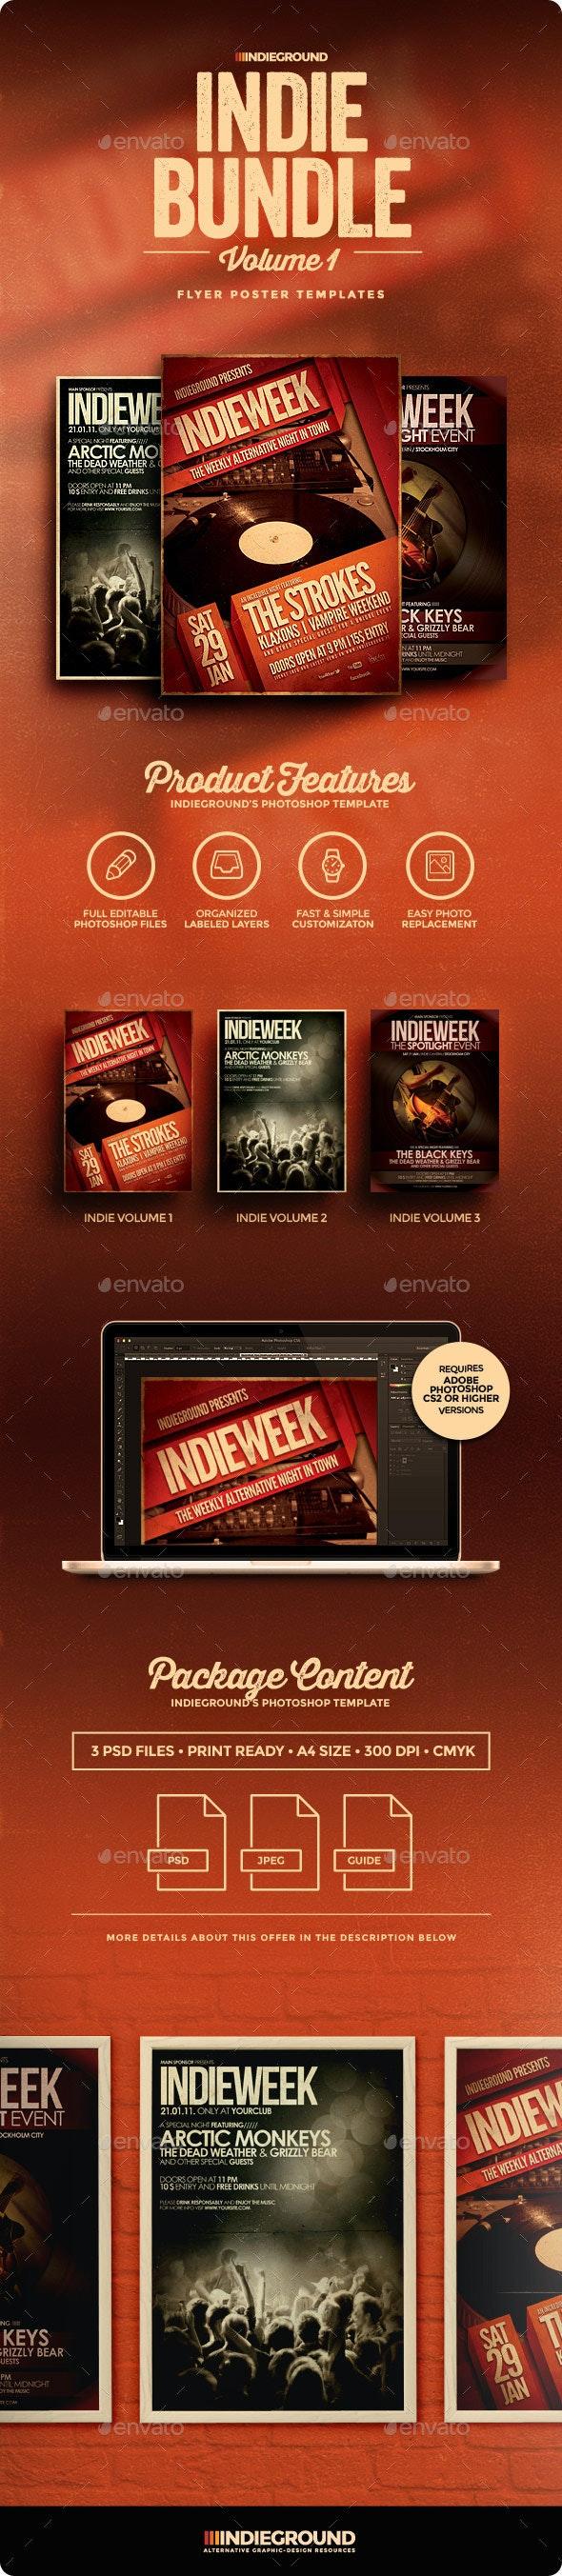 Indie Flyer/Poster Bundle Vol. 1-3 - Clubs & Parties Events